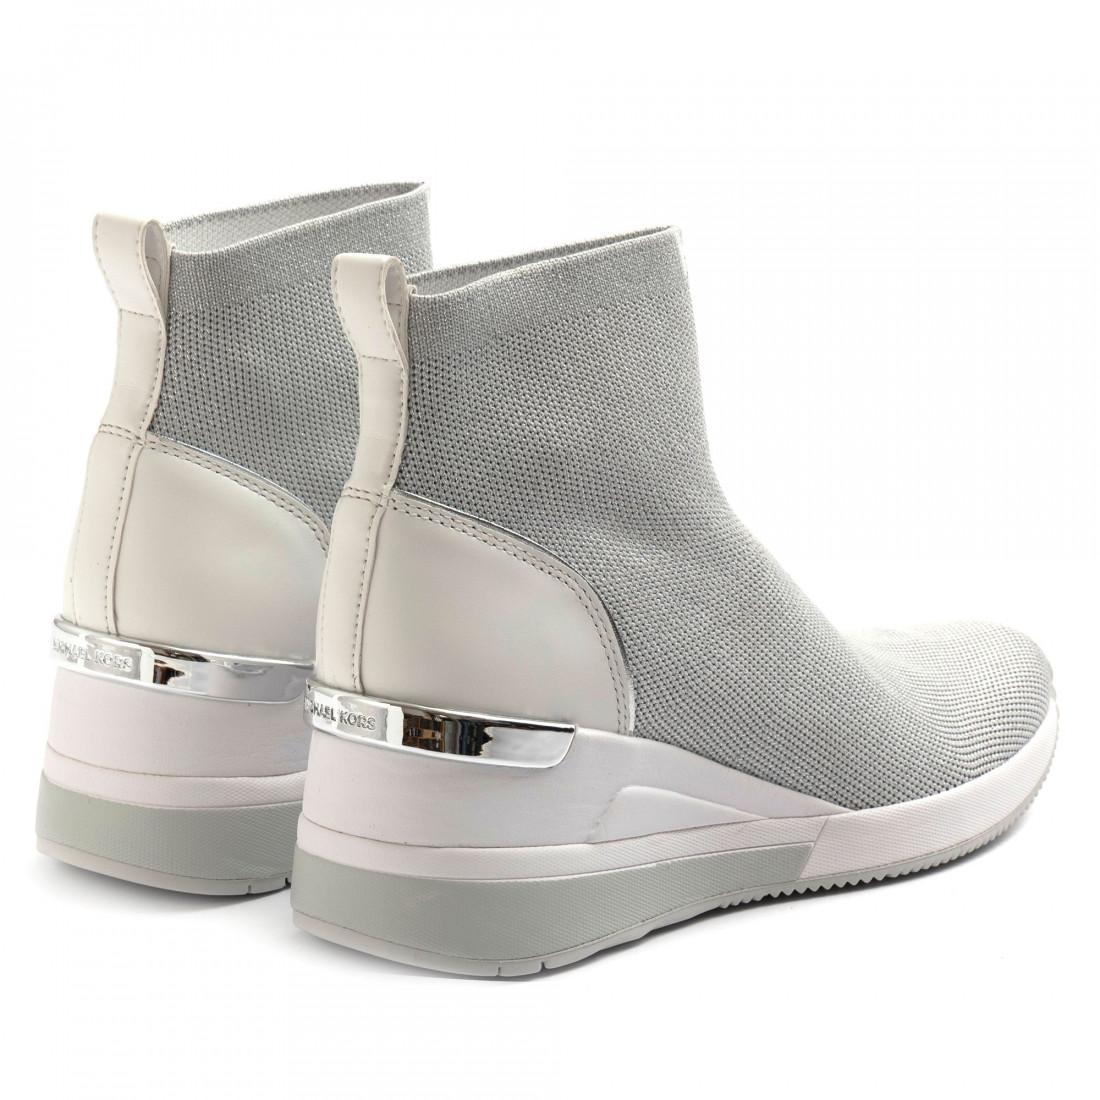 sneakers donna michael kors 43s1skfe1d042 8457